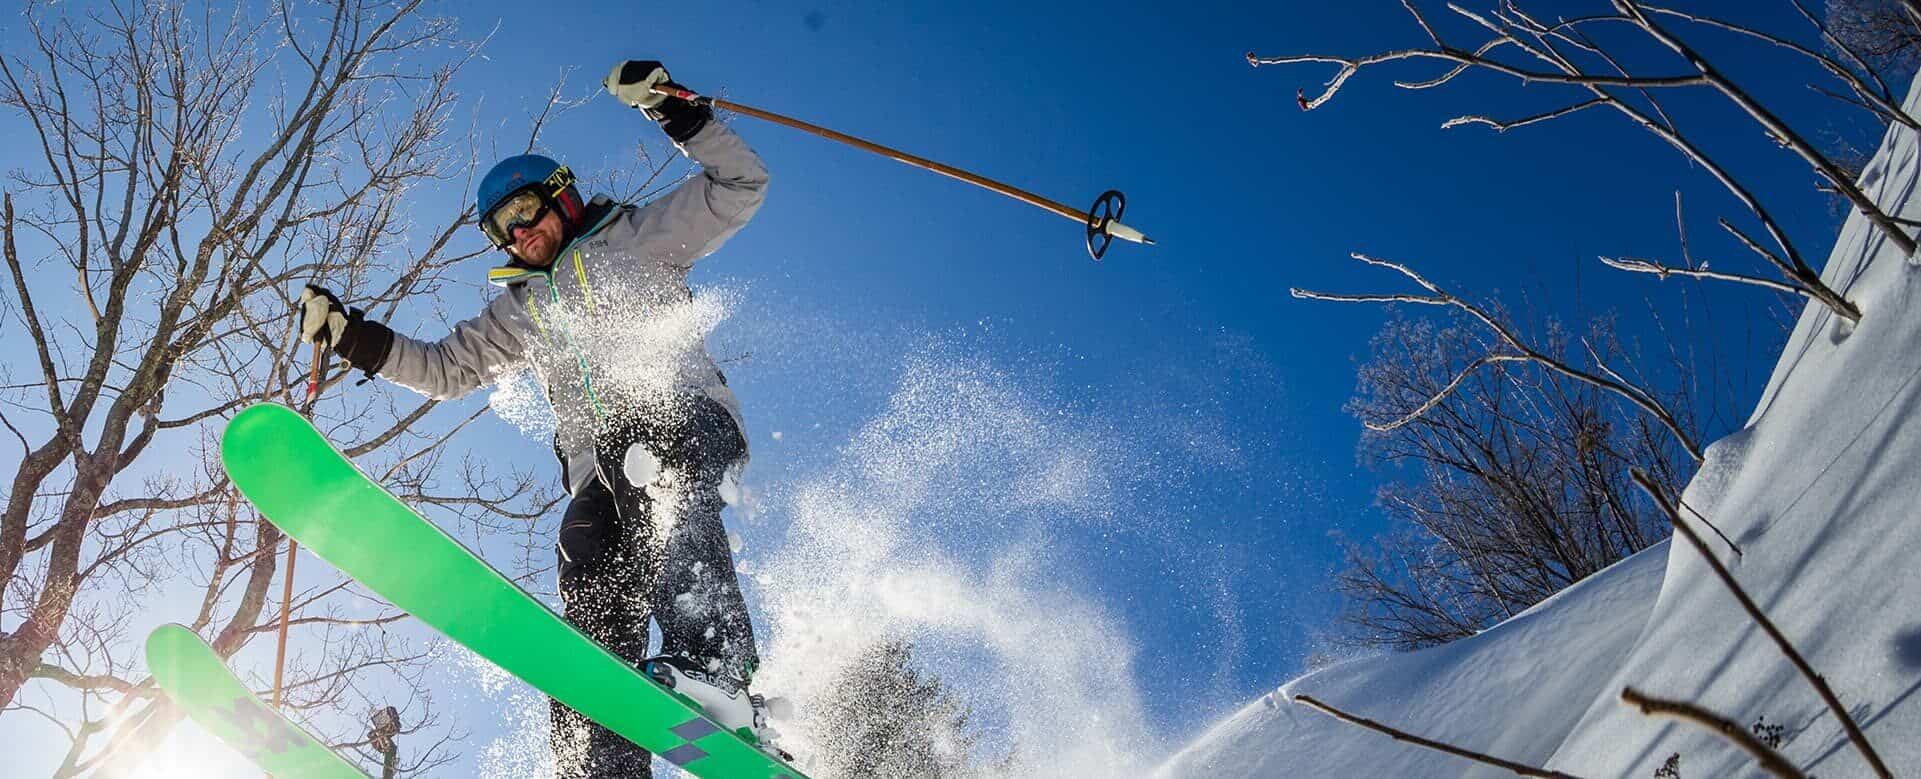 Greater Wausau - Granite Peak Skiing